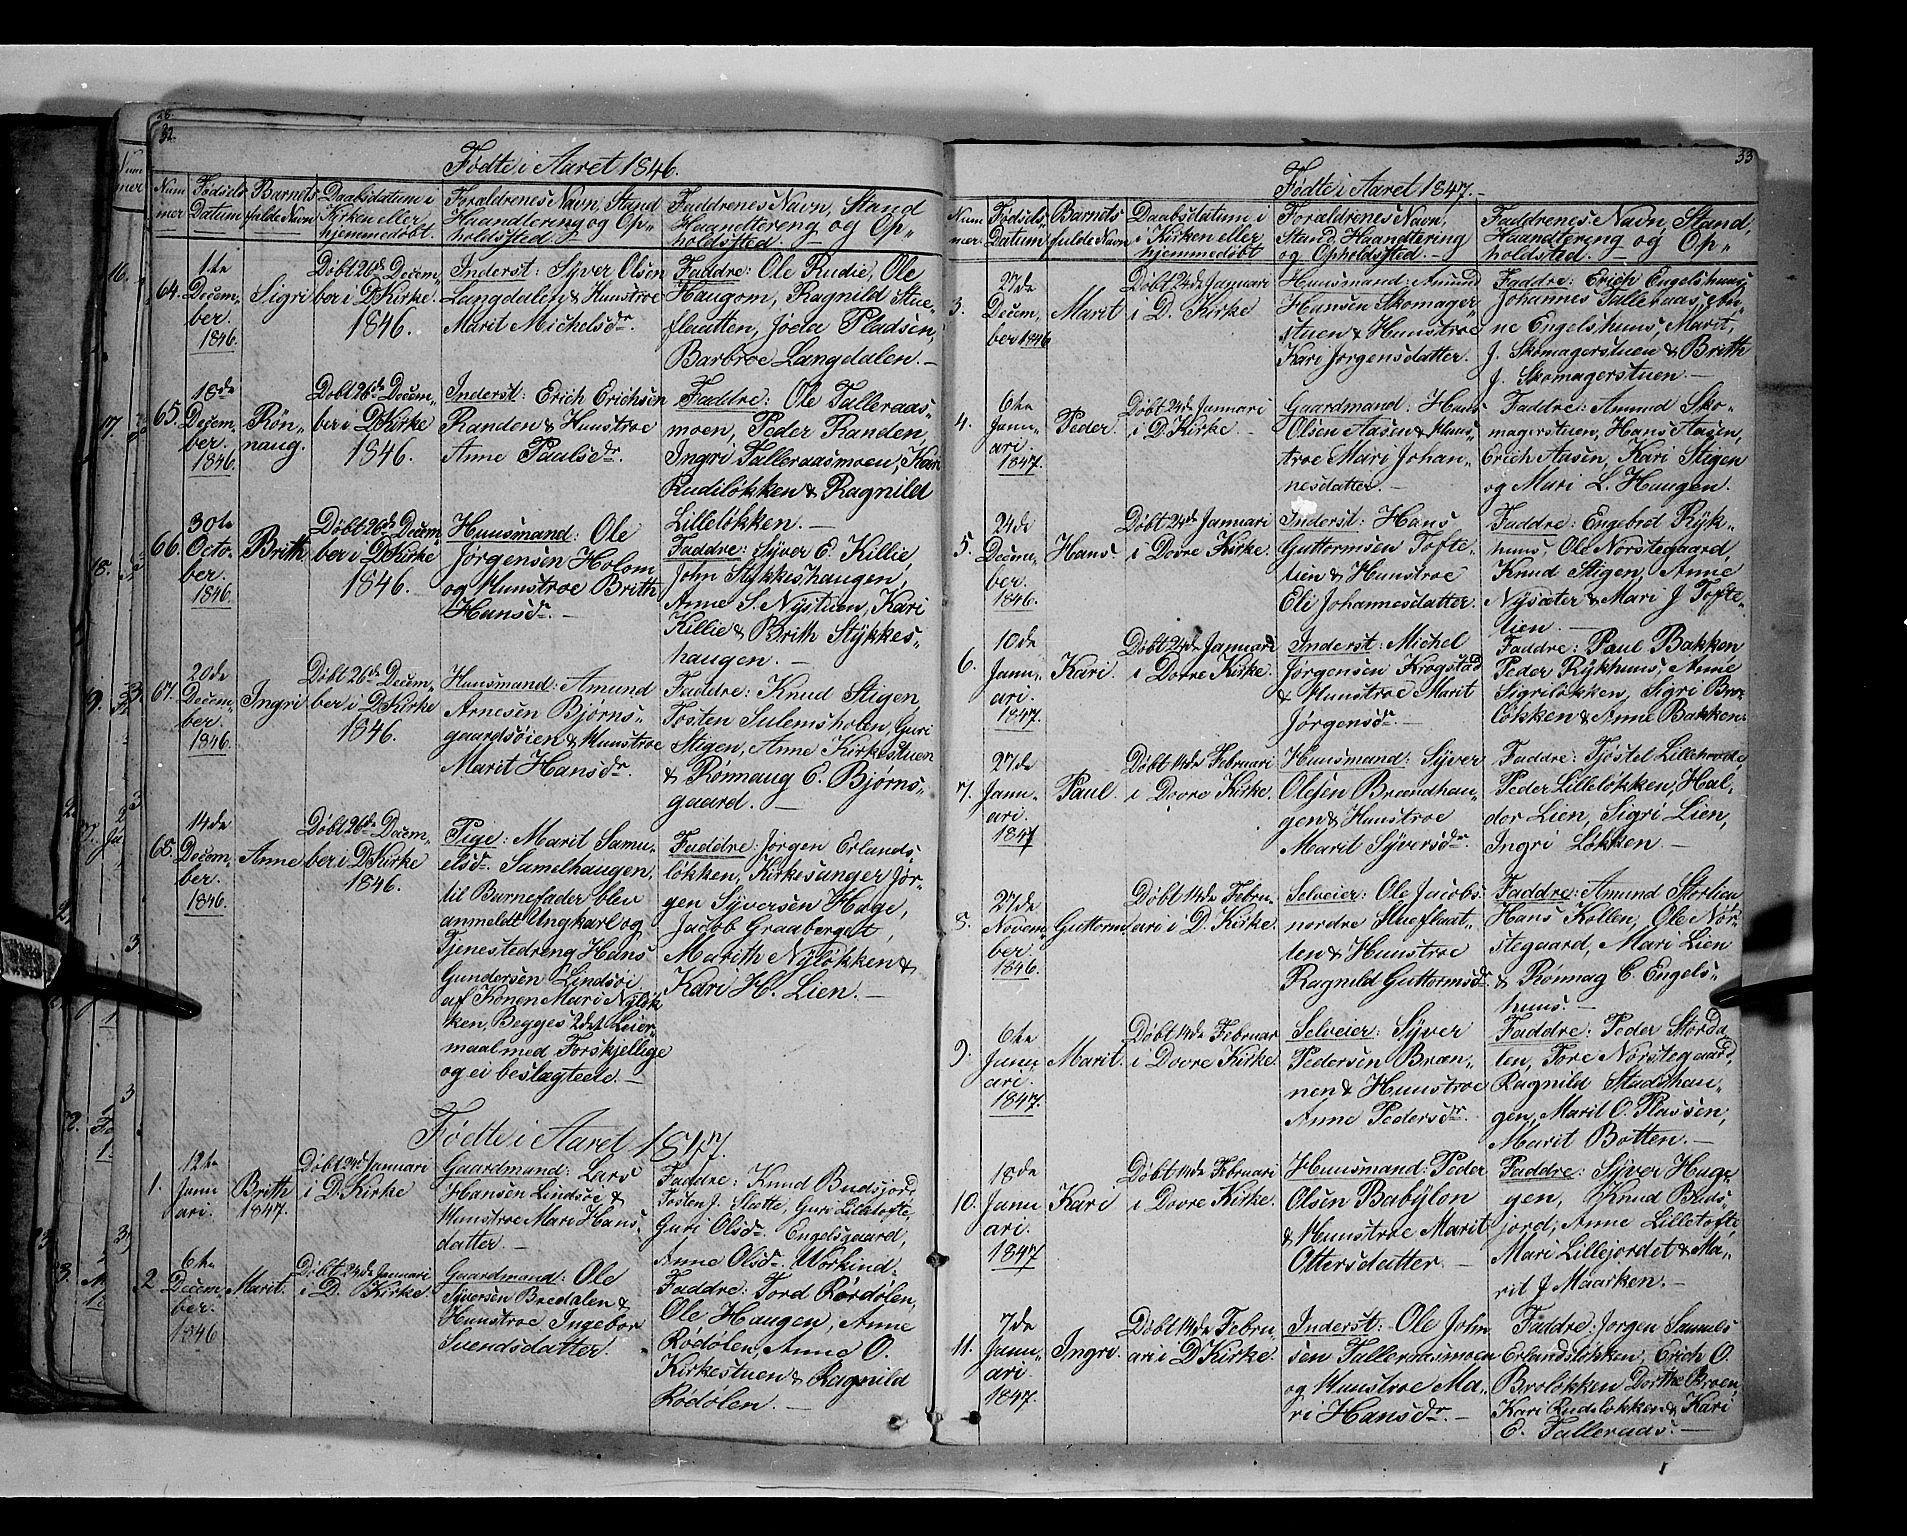 SAH, Lesja prestekontor, Klokkerbok nr. 3, 1842-1862, s. 32-33